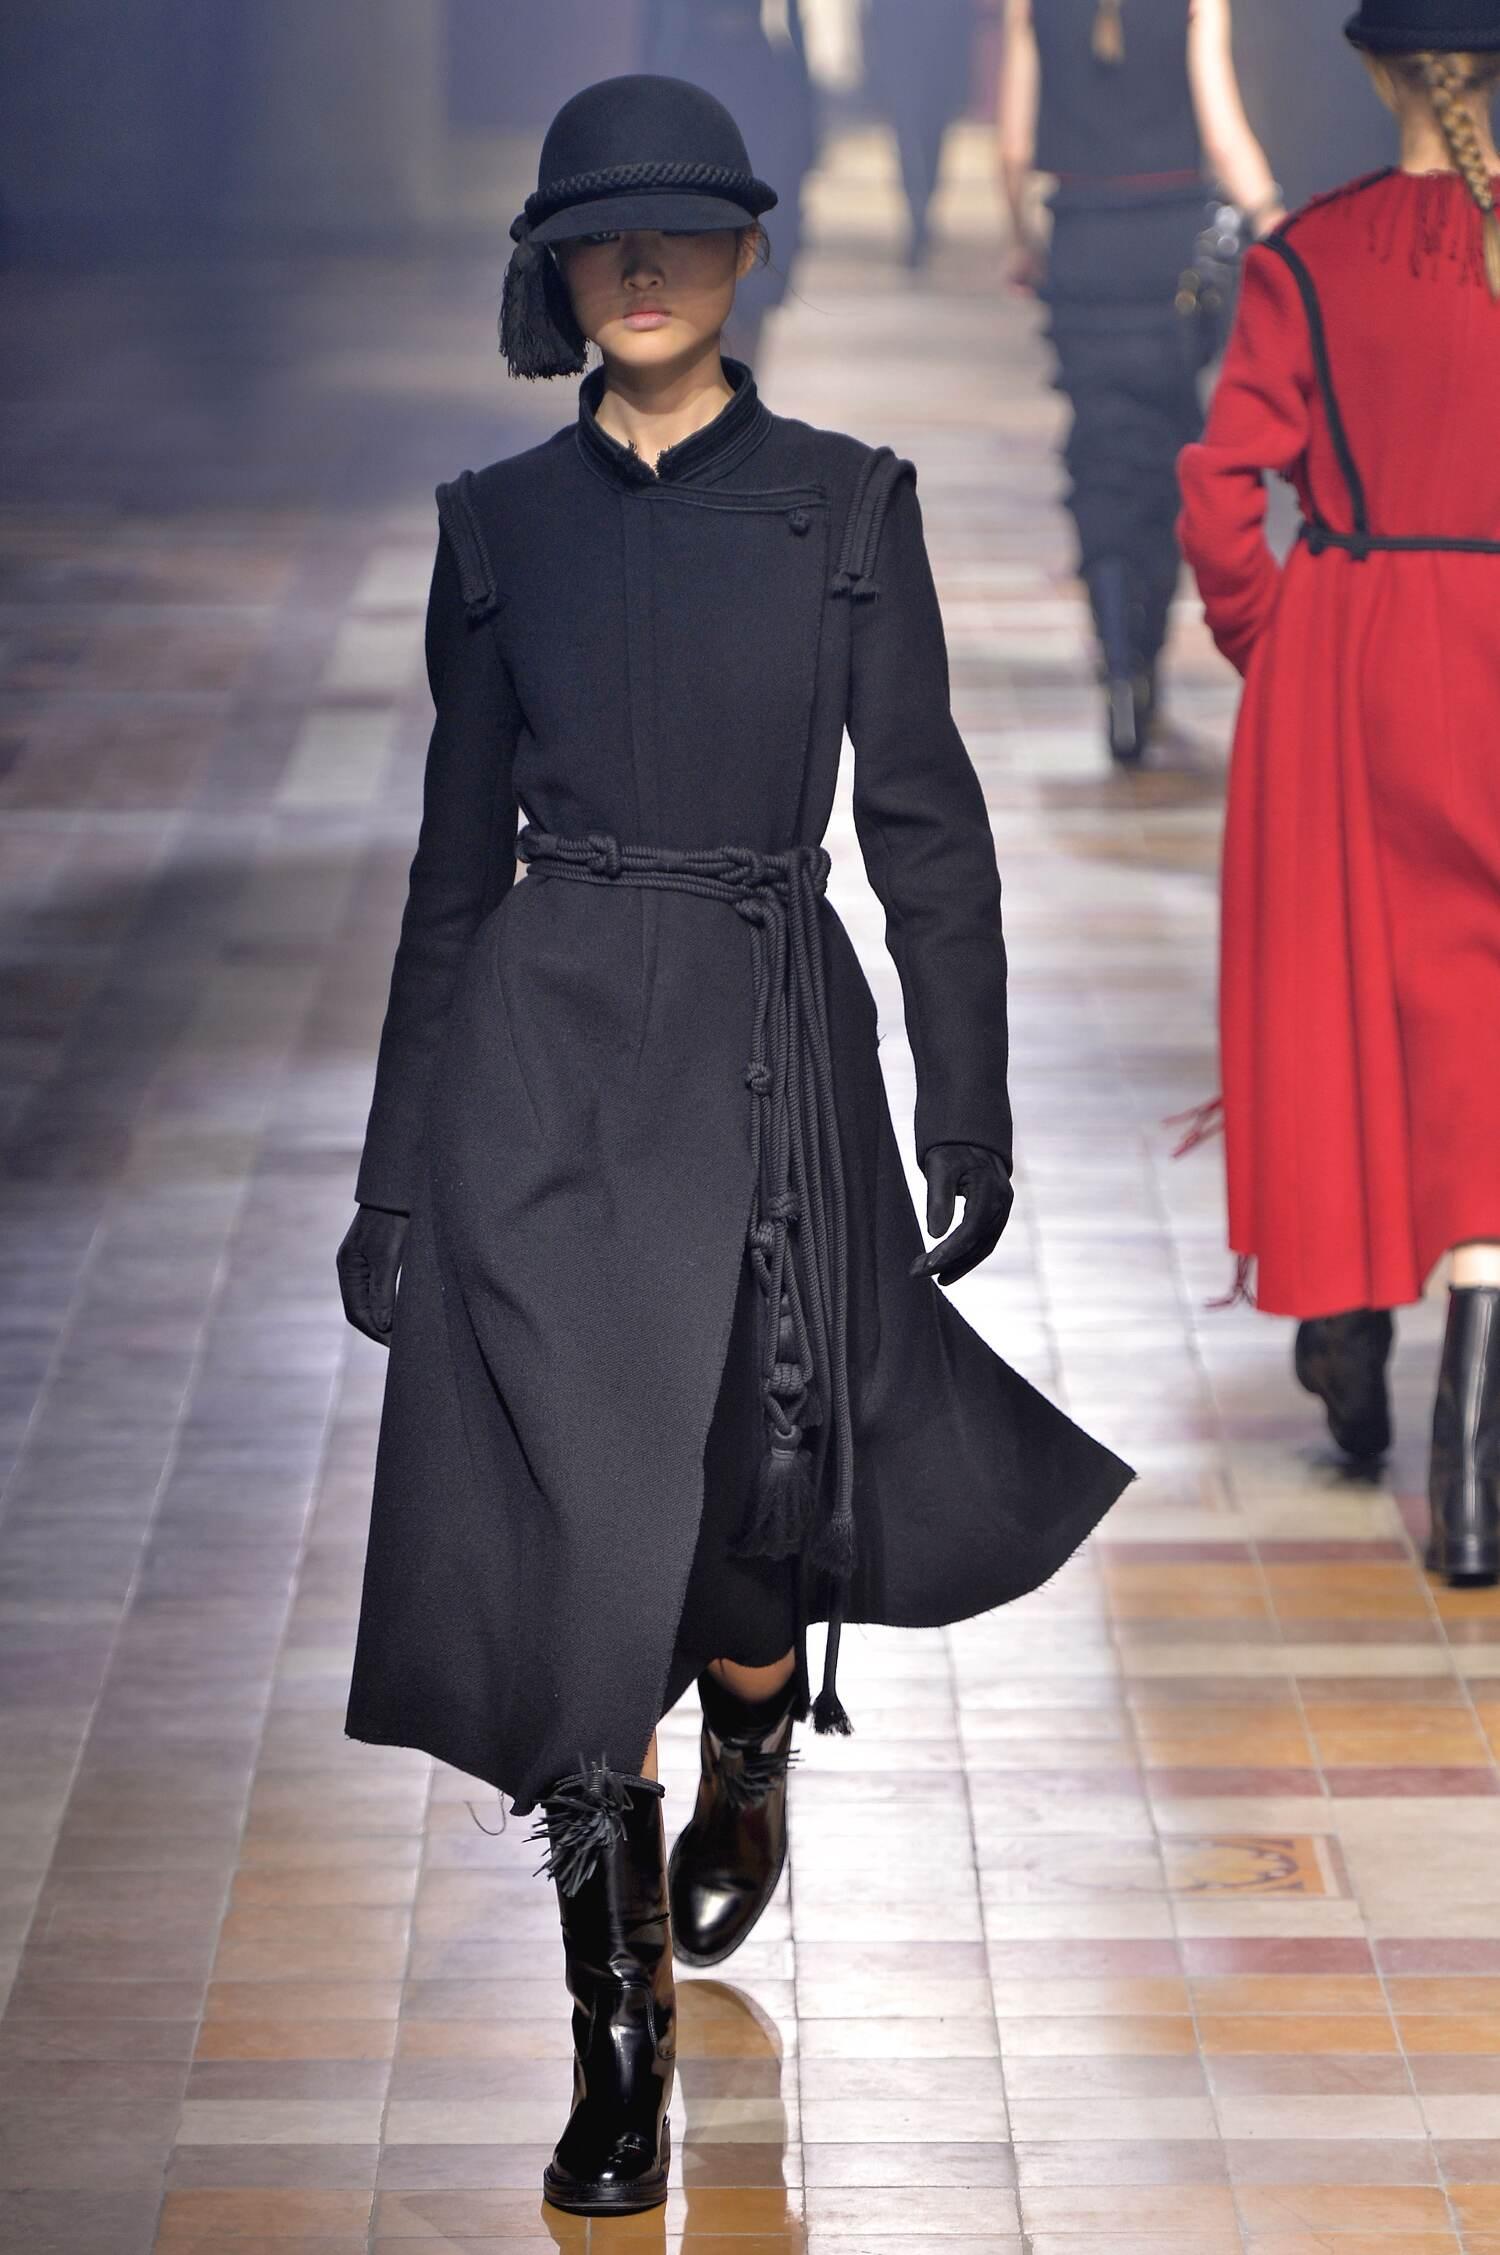 Lanvin Fall Winter 2015 16 Womenswear Collection Paris Fashion Week Fashion Show